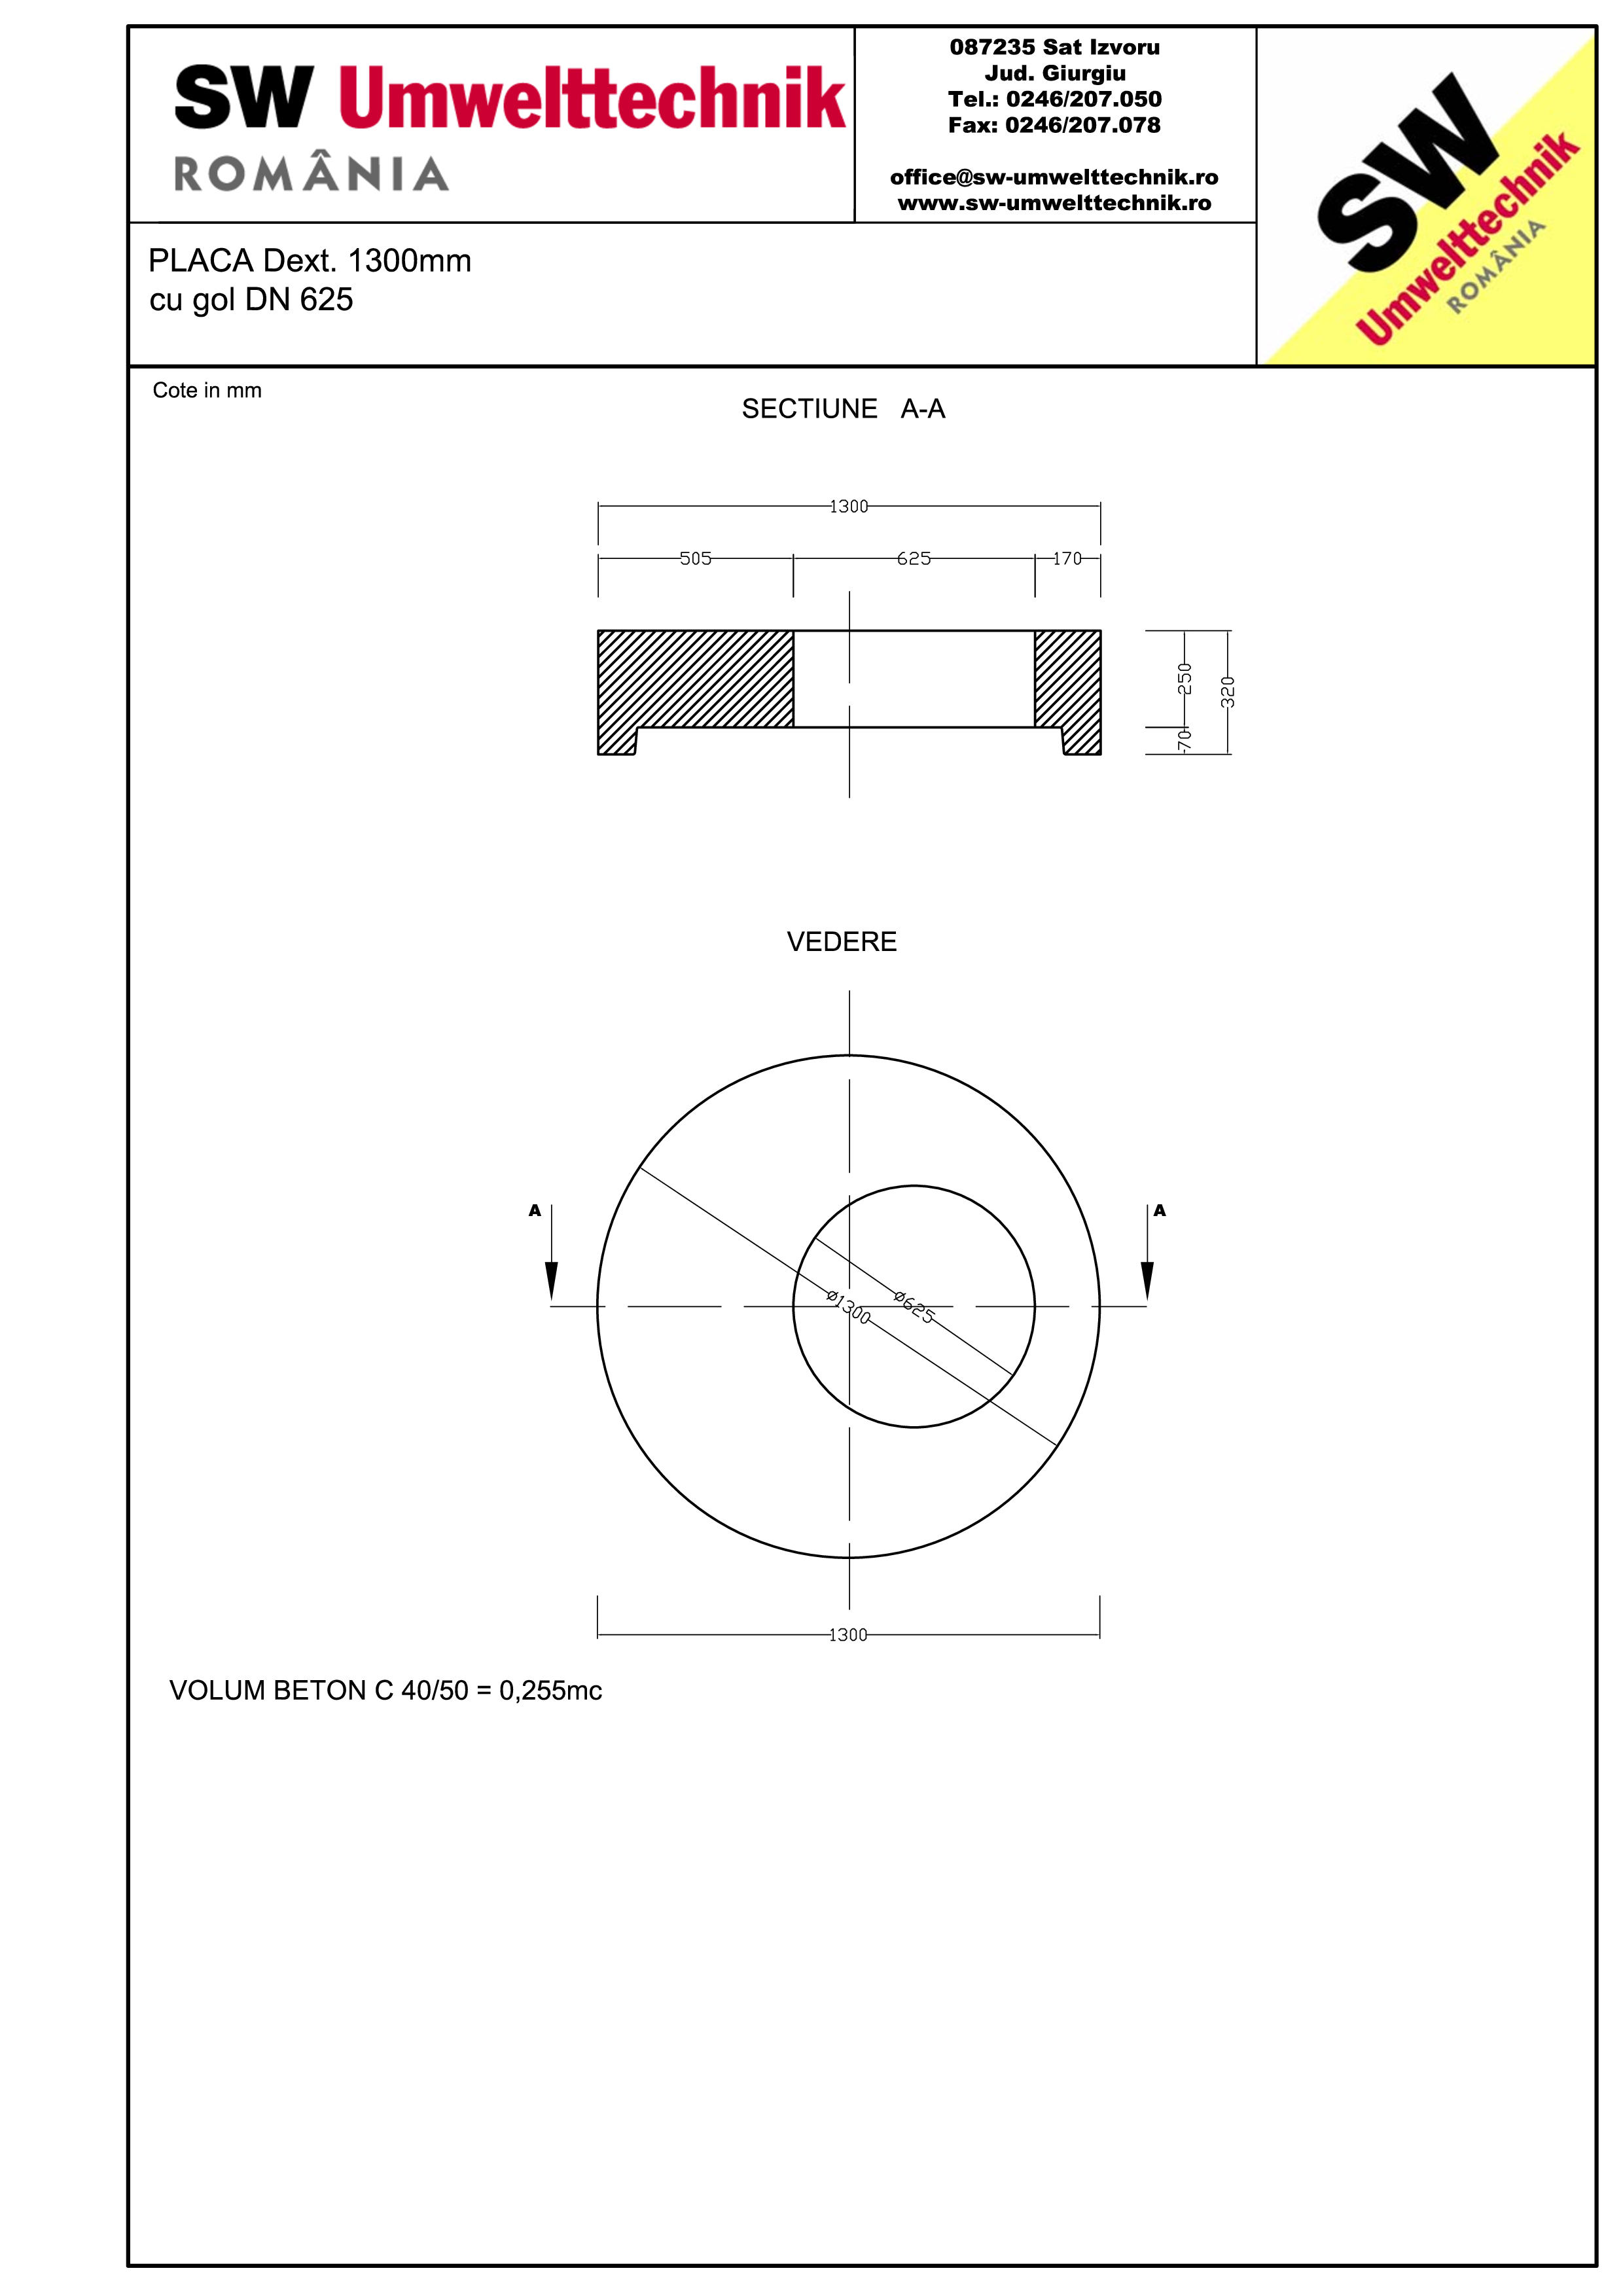 Pagina 1 - CAD-PDF Placa Dext.1300 H250 cu gol DN625 SW UMWELTTECHNIK Detaliu de produs